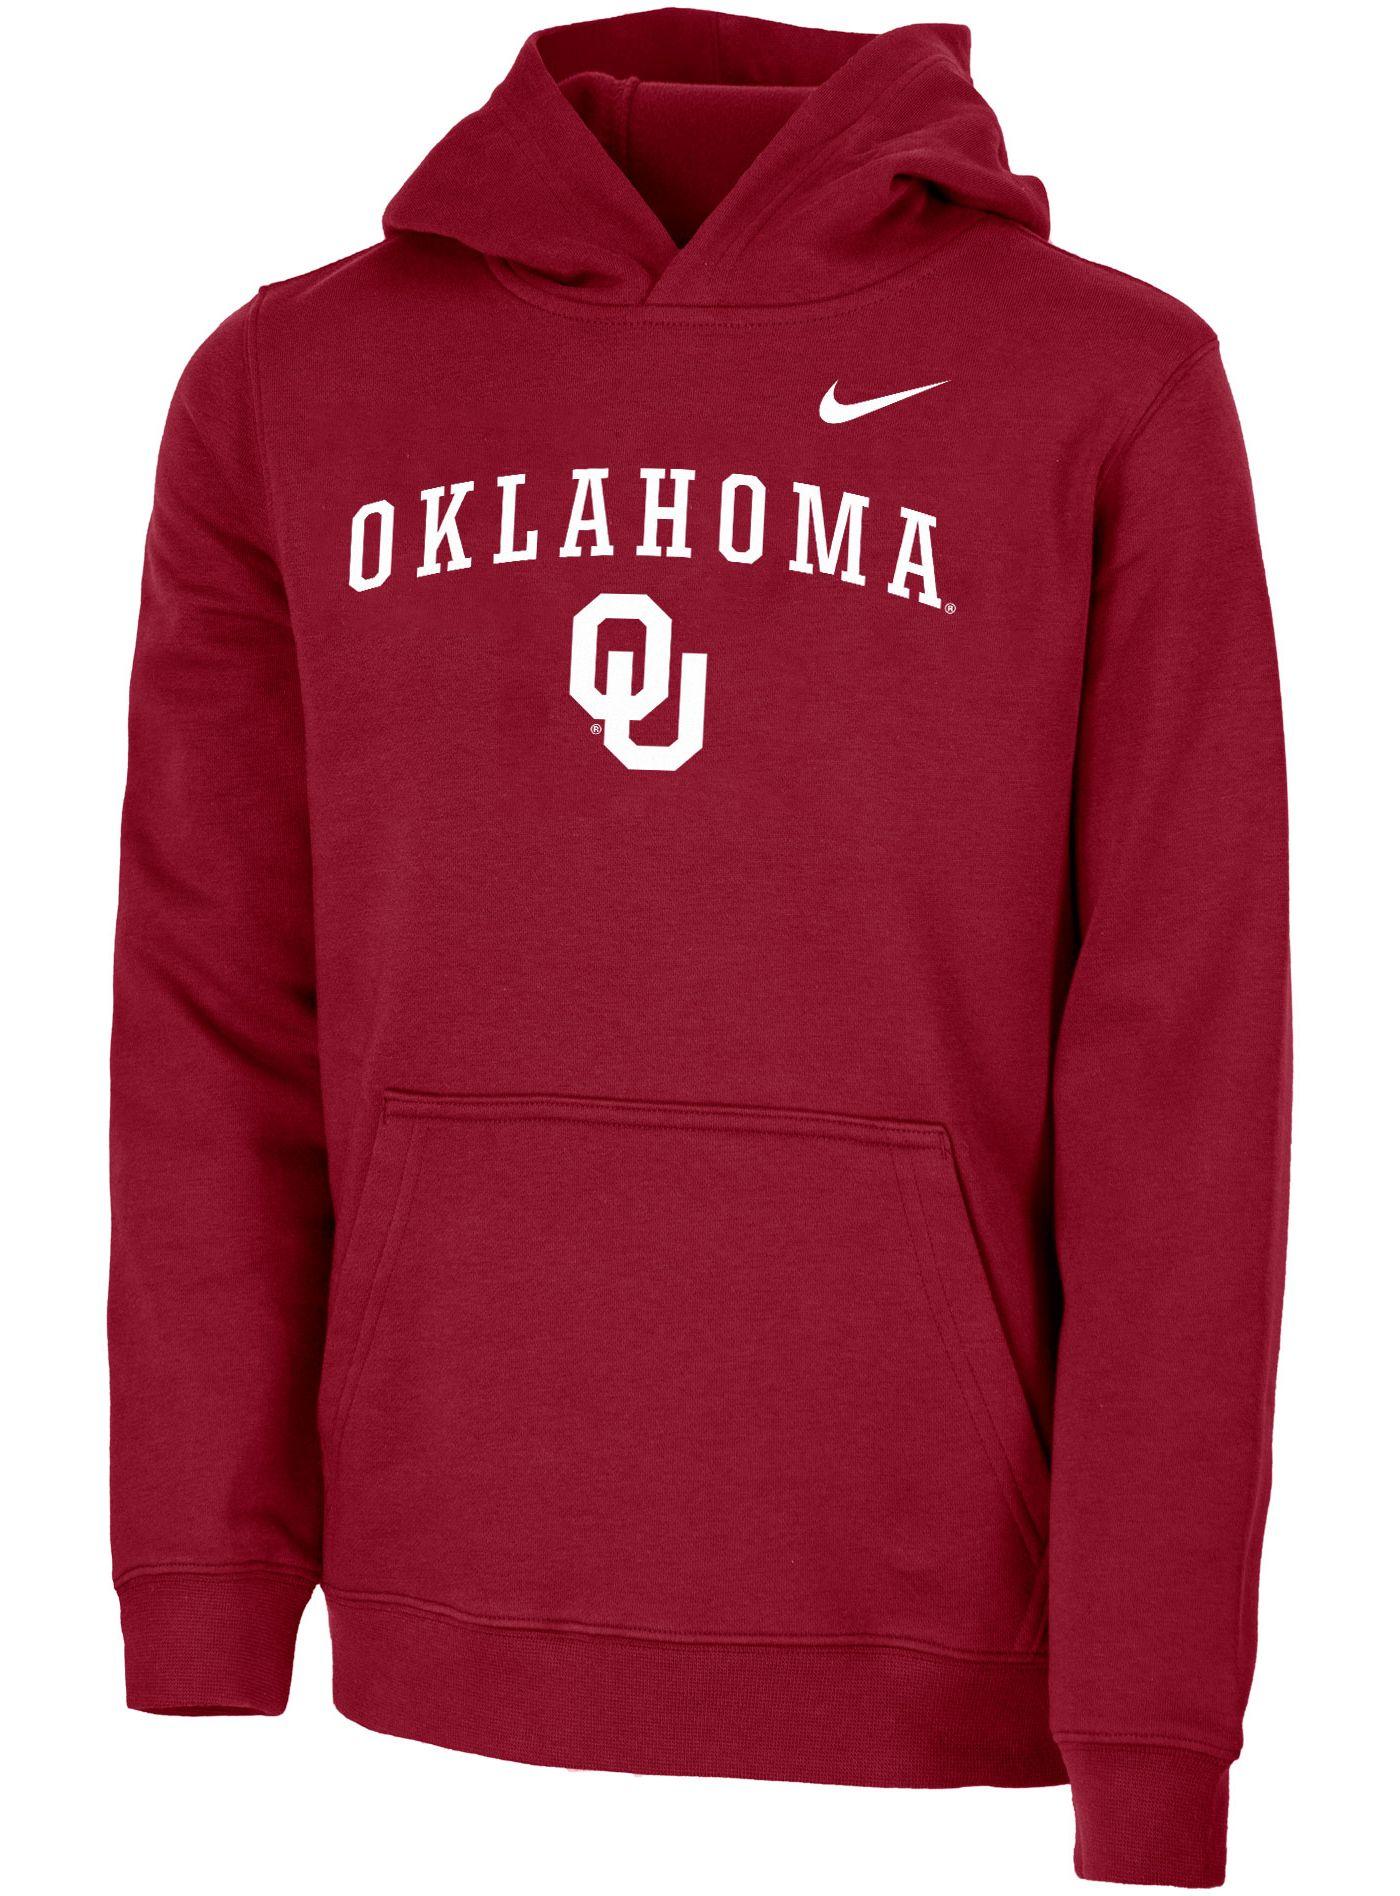 Nike Youth Oklahoma Sooners Crimson Club Fleece Pullover Hoodie